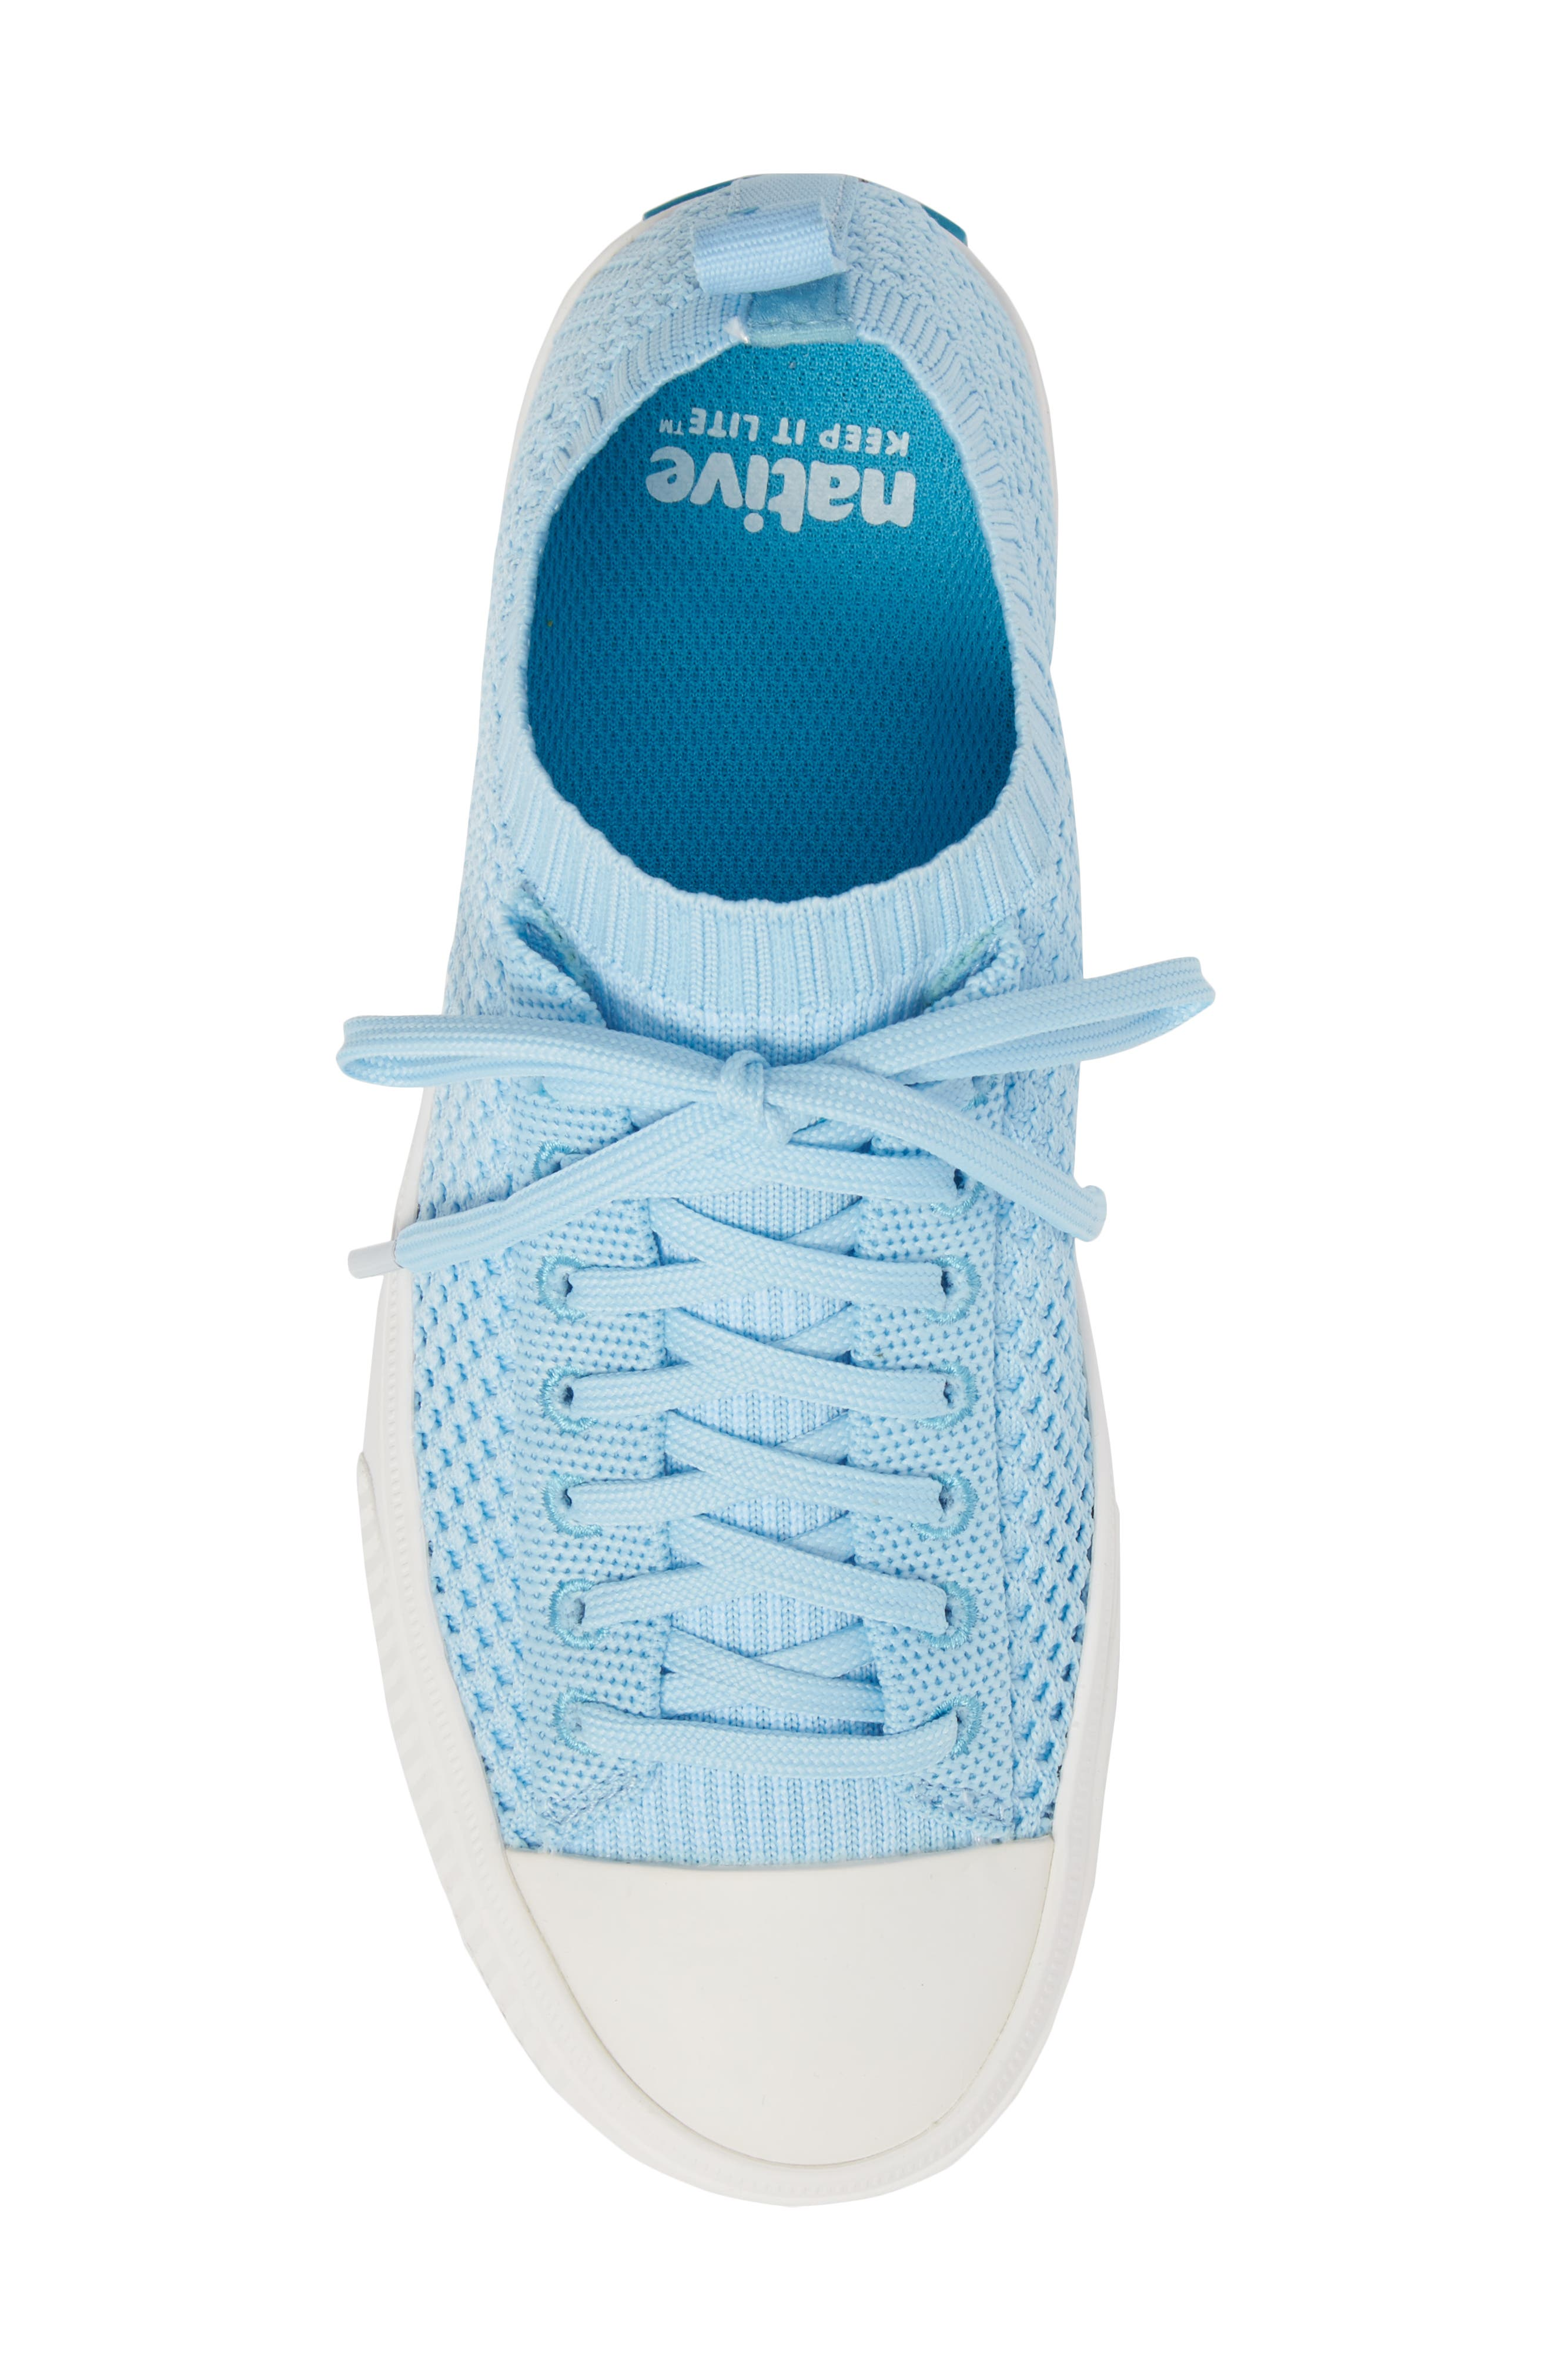 Jefferson 2.0 Liteknit Sneaker,                             Alternate thumbnail 5, color,                             Sky Blue/ Shell White